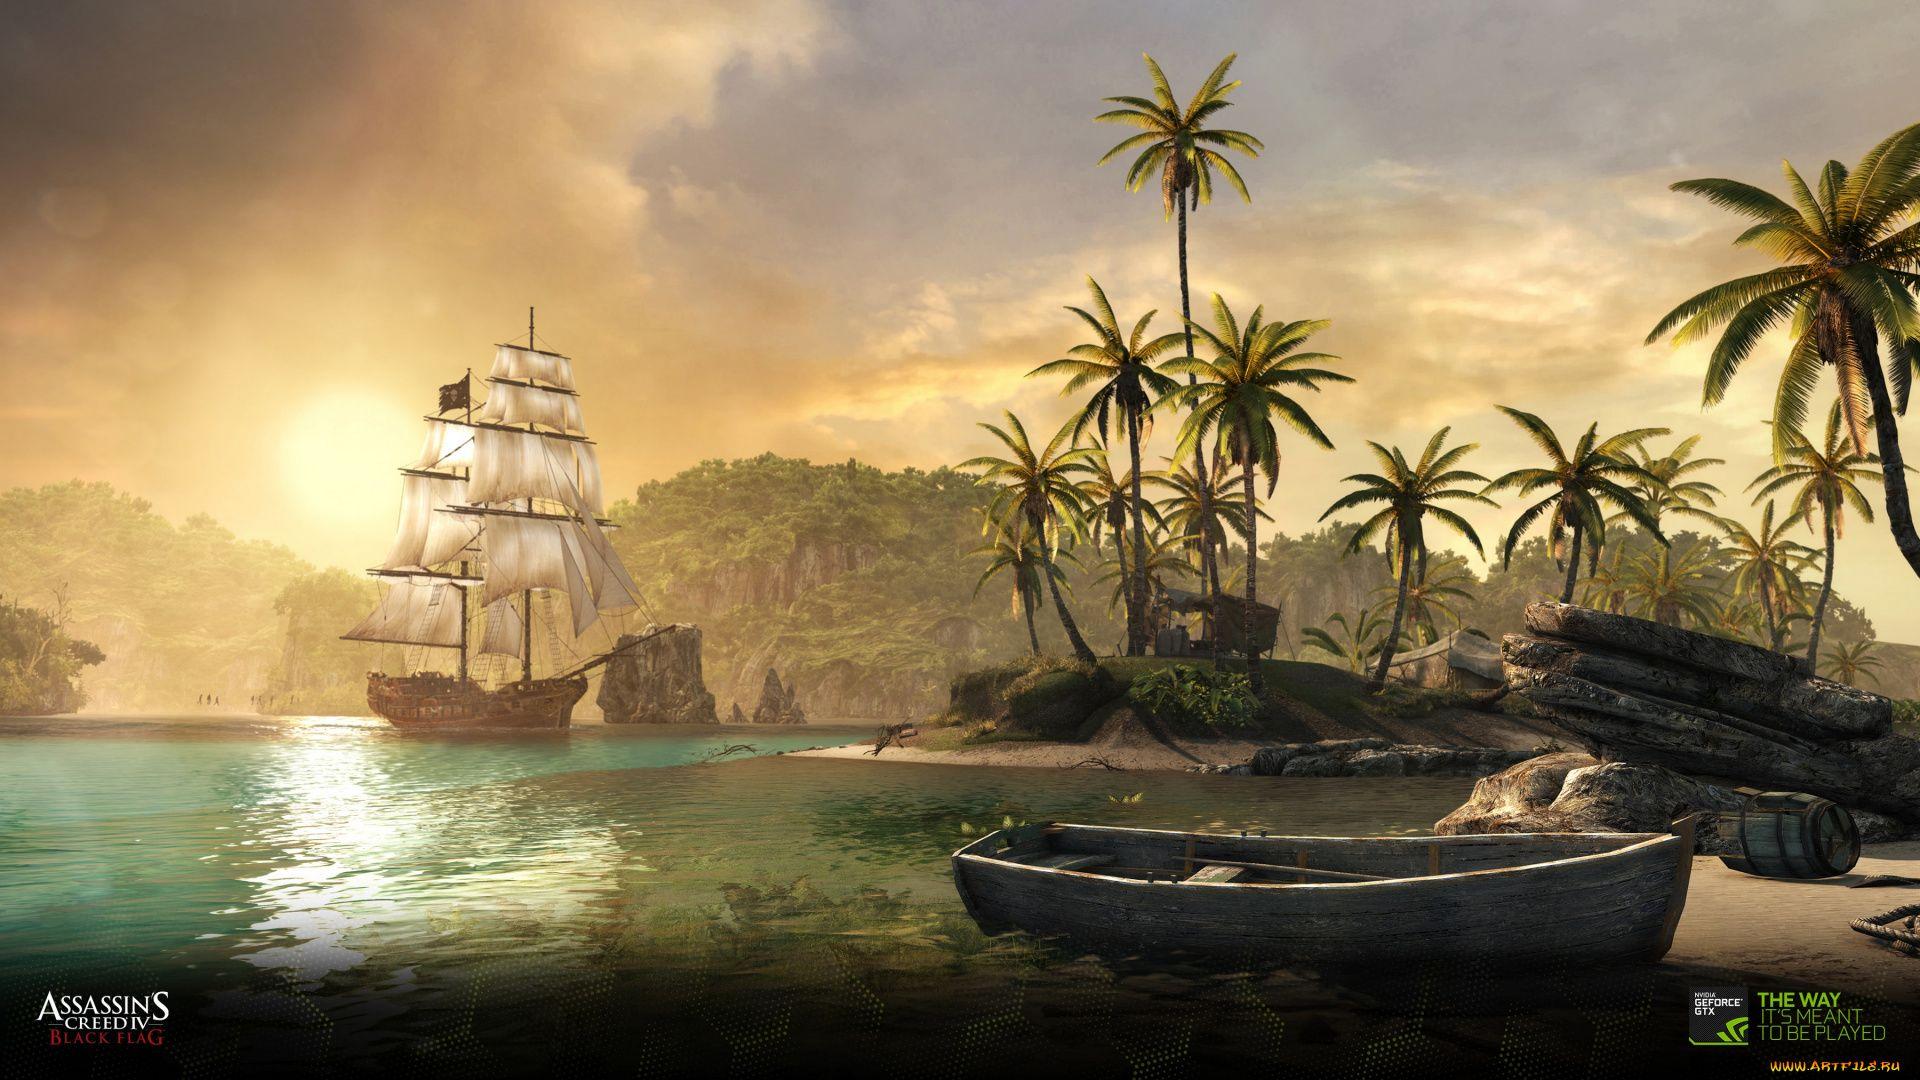 Ship wallpaper picture hd